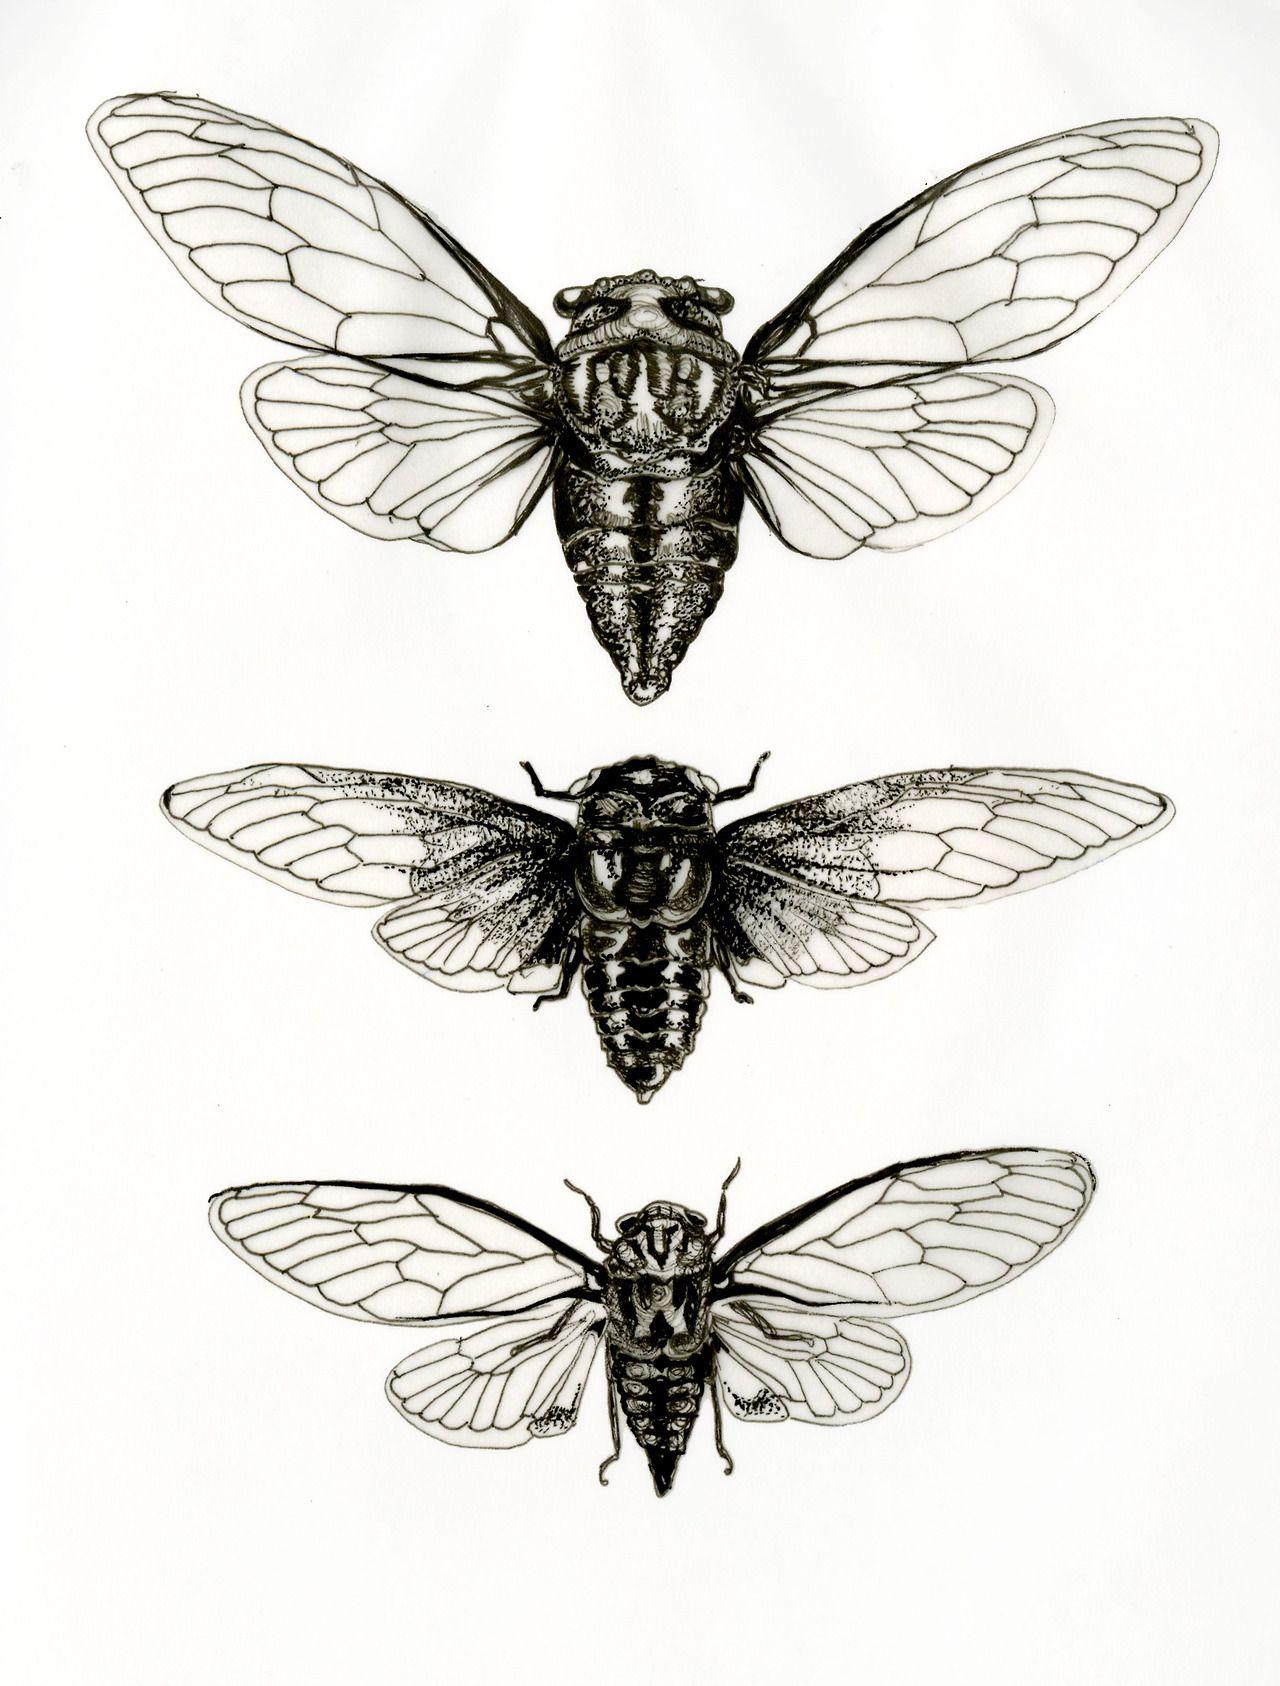 mirandamontes cicada studies ink miranda montes art pinte. Black Bedroom Furniture Sets. Home Design Ideas